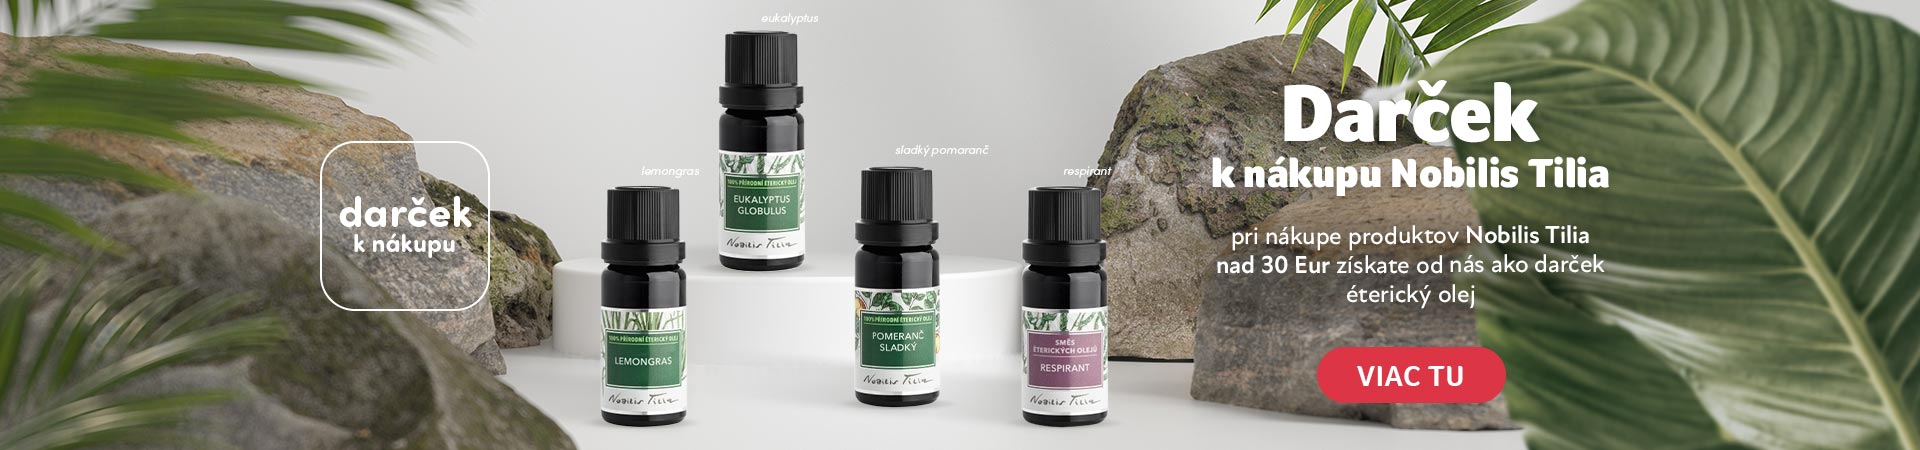 nobilis darček aromathera